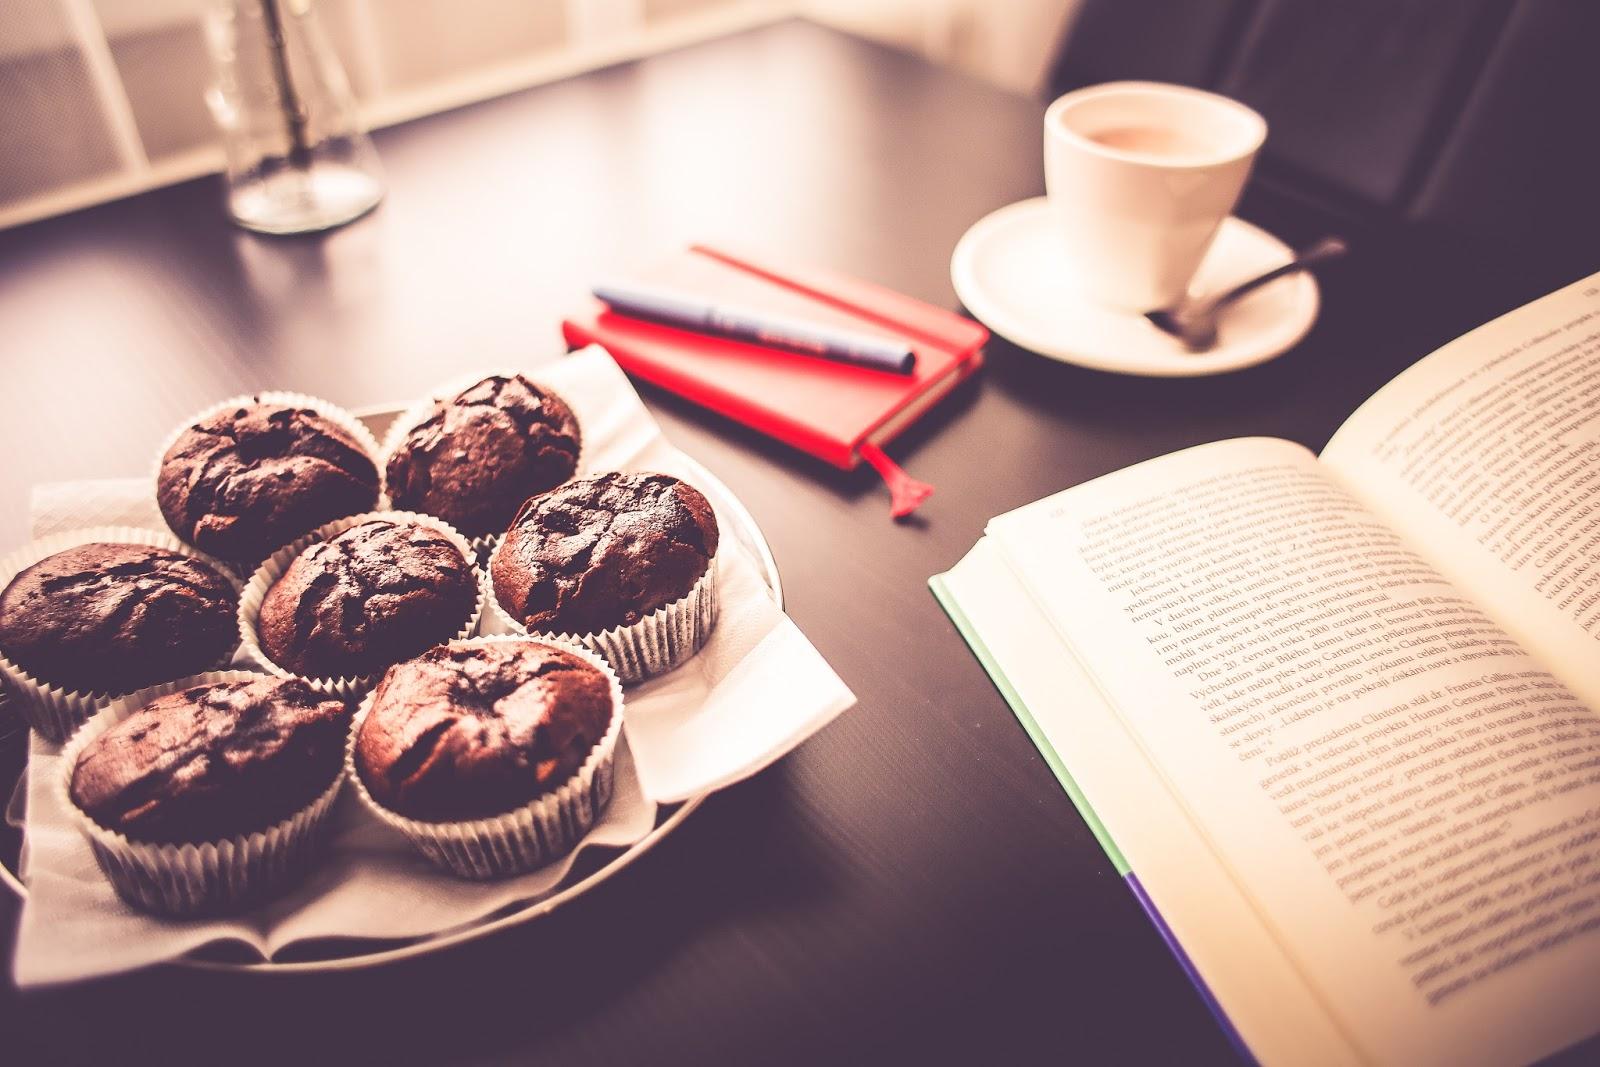 Inspiring reads